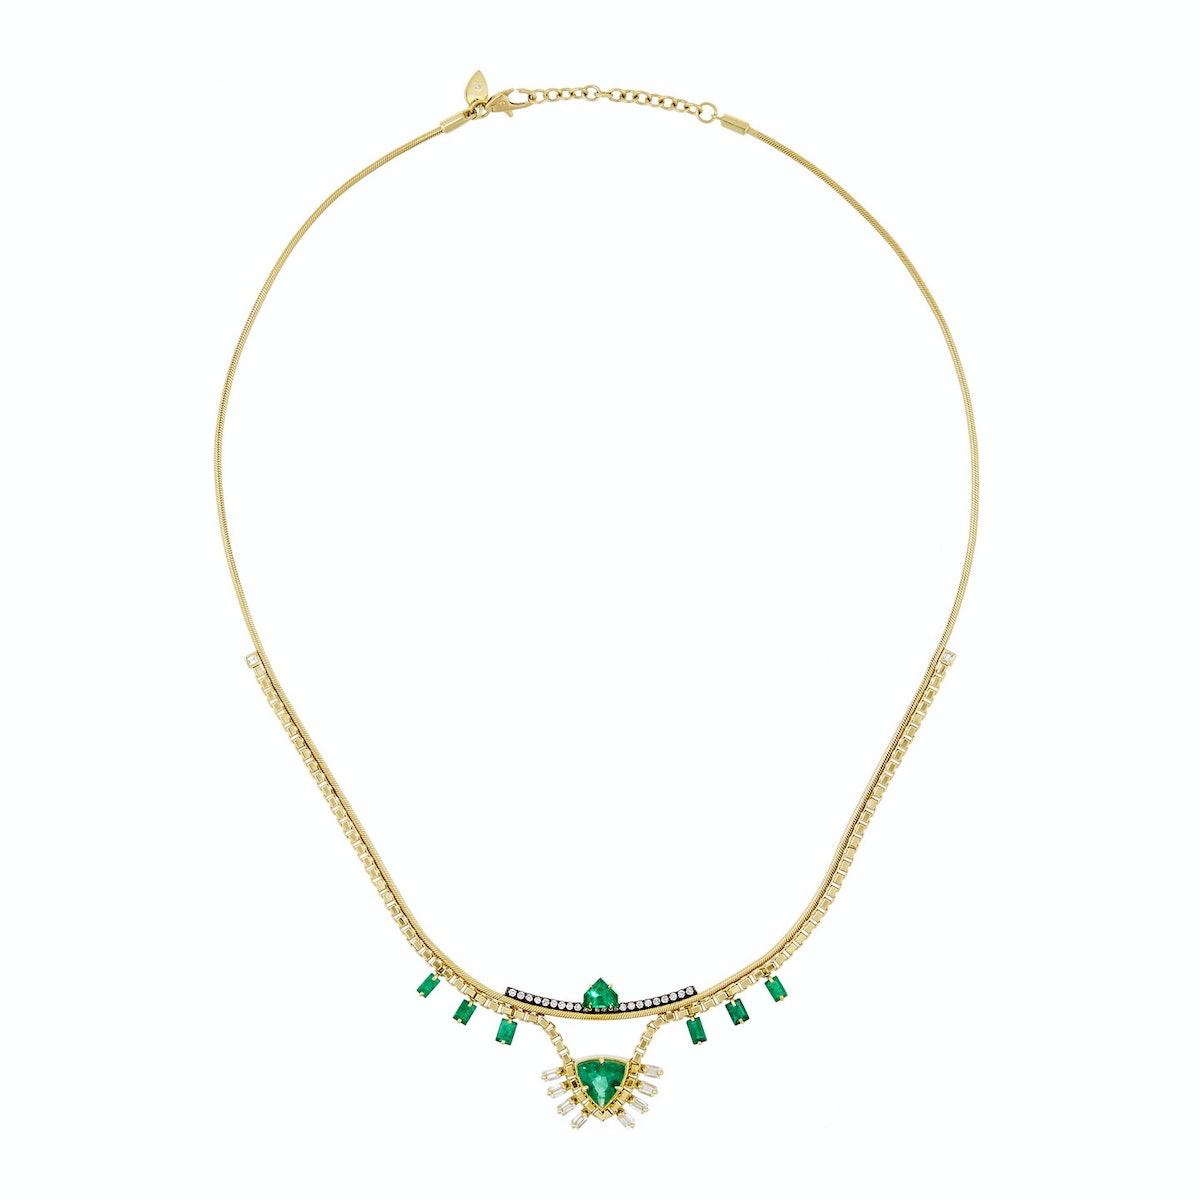 Jemma Wynne 18-karat gold diamond and emerald necklace